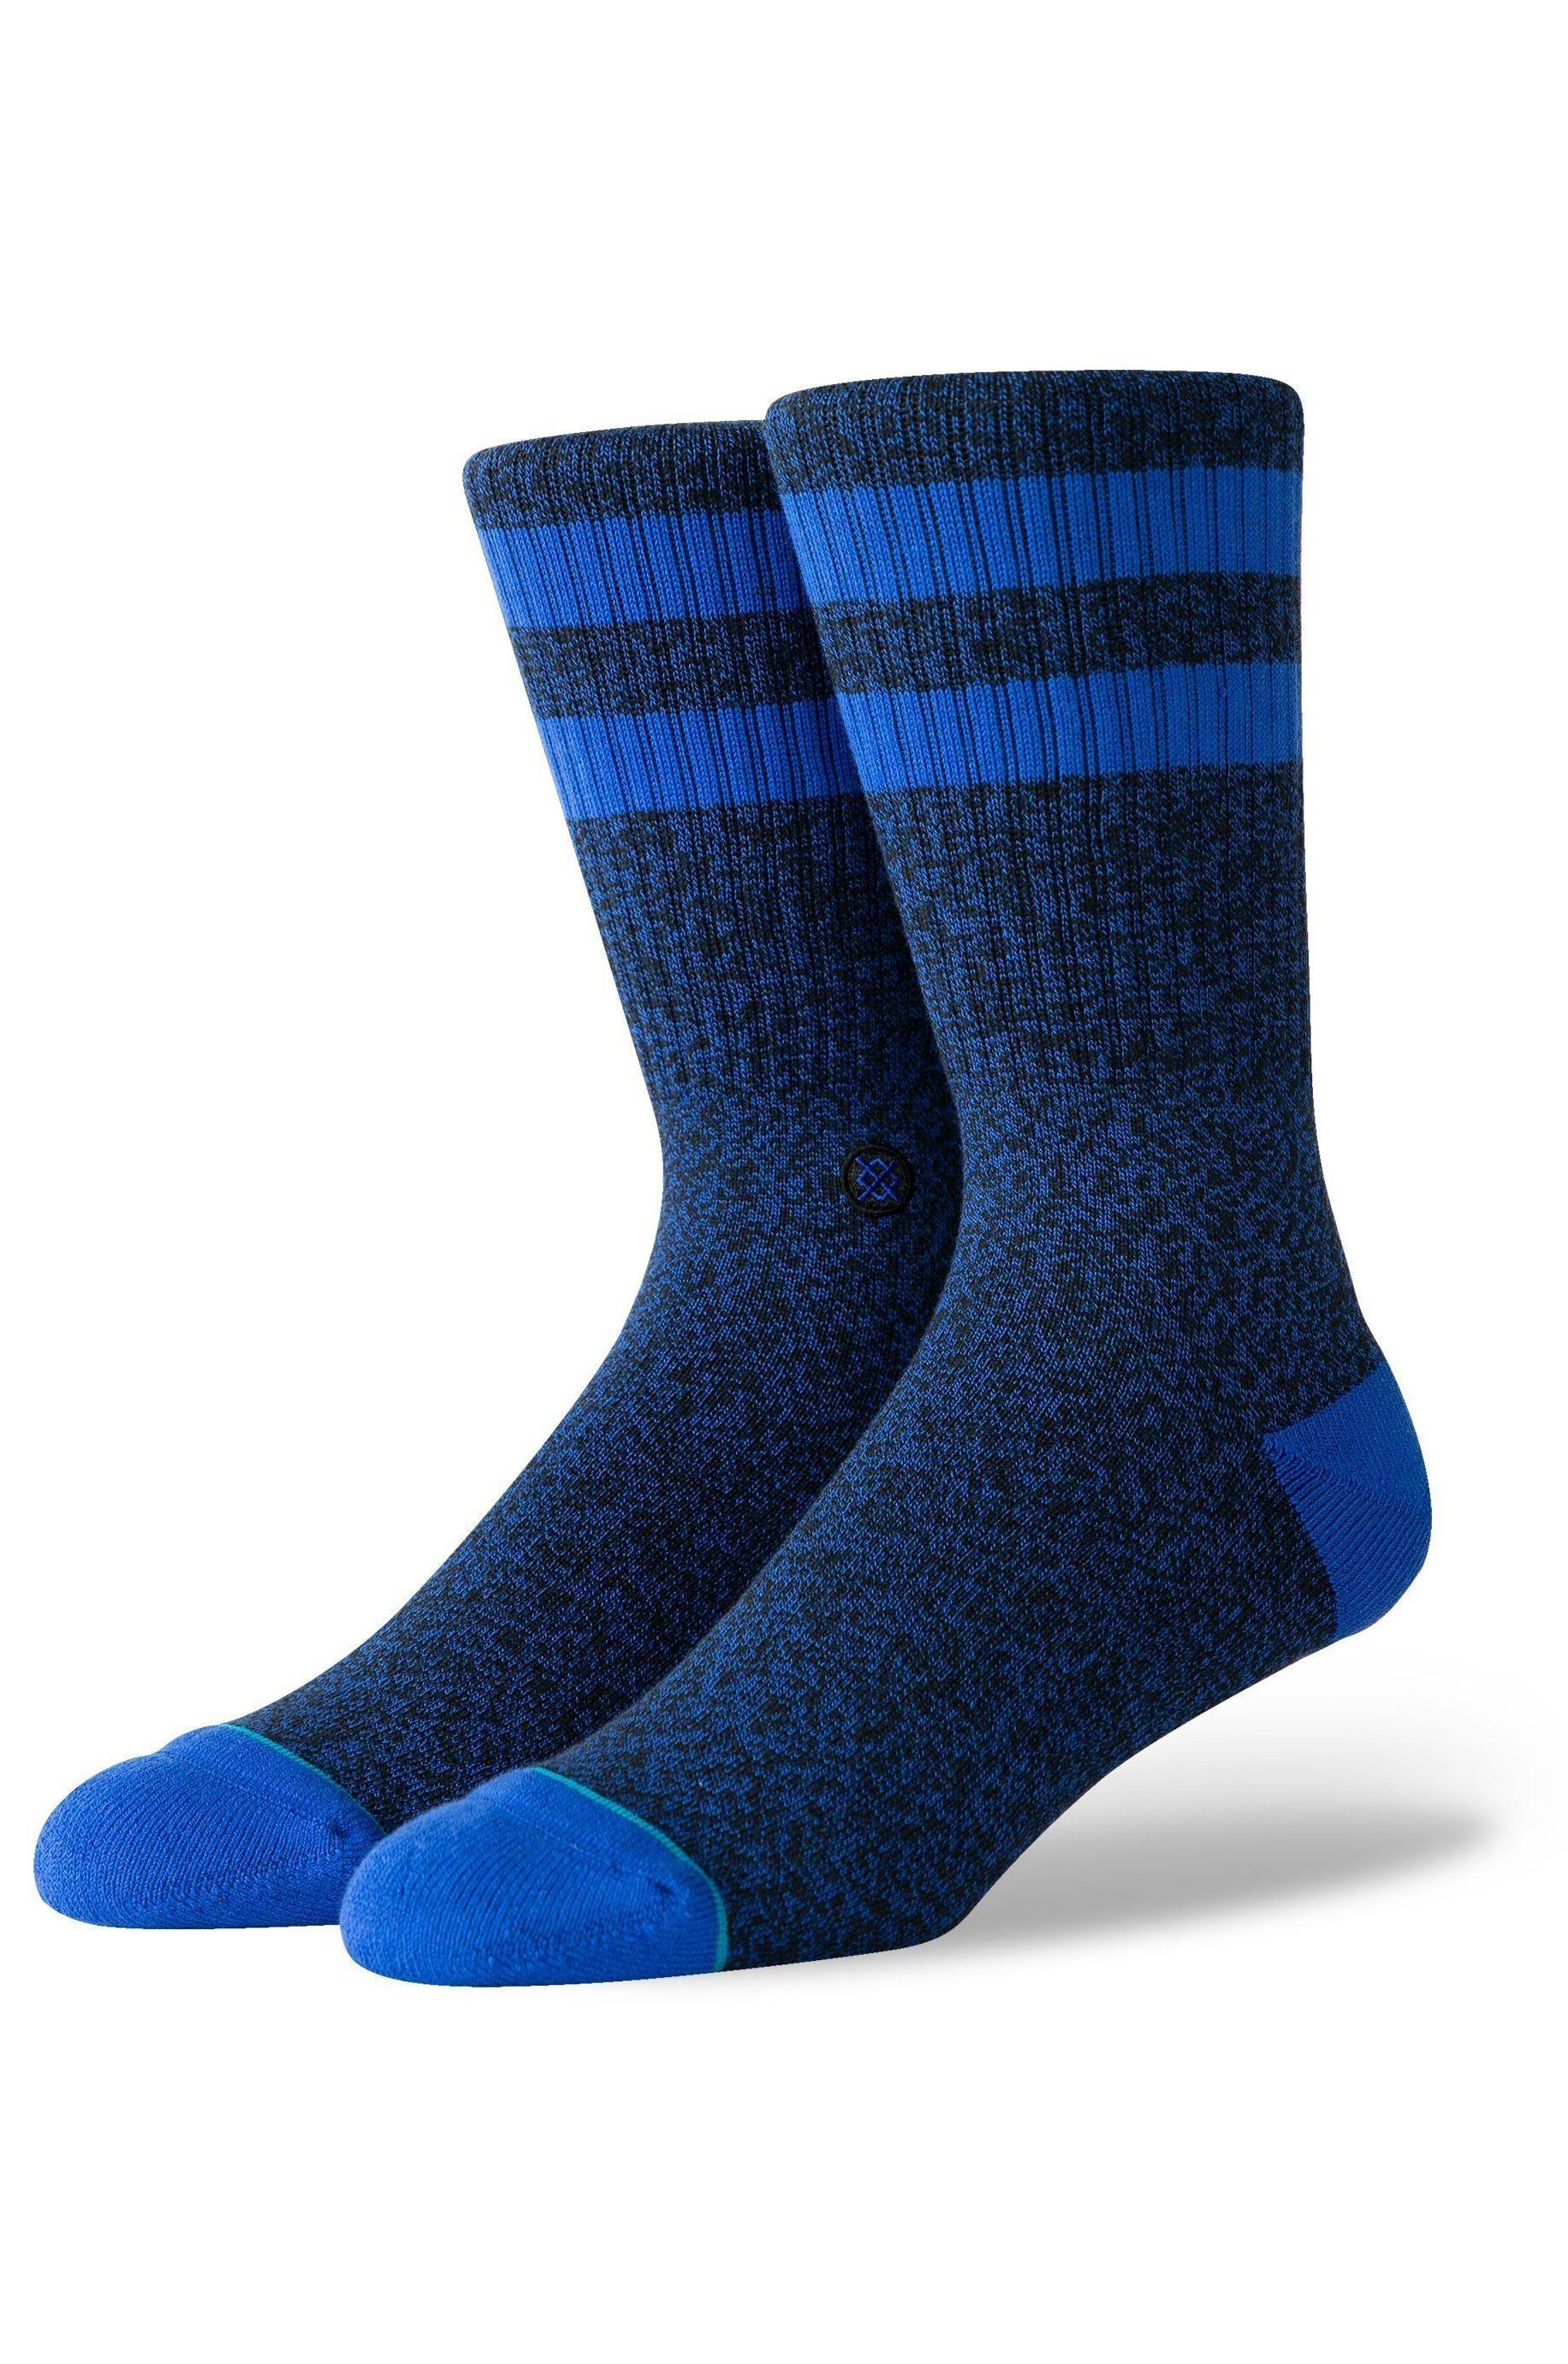 Stance Socks JOVEN Blue